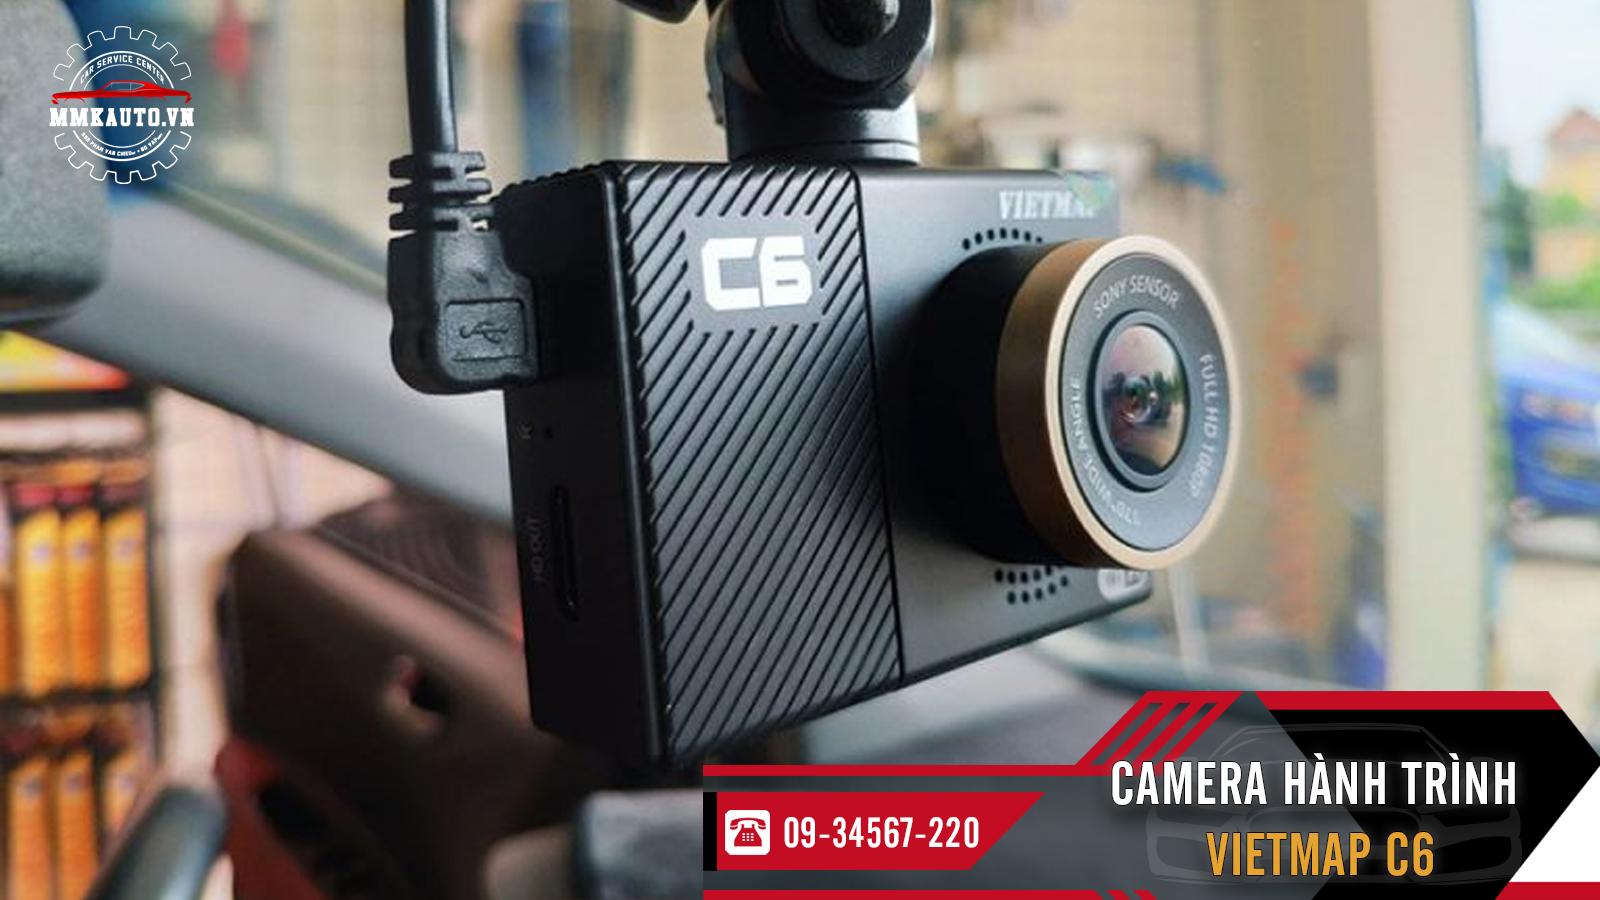 camera hanh trinh Vietpmap C6